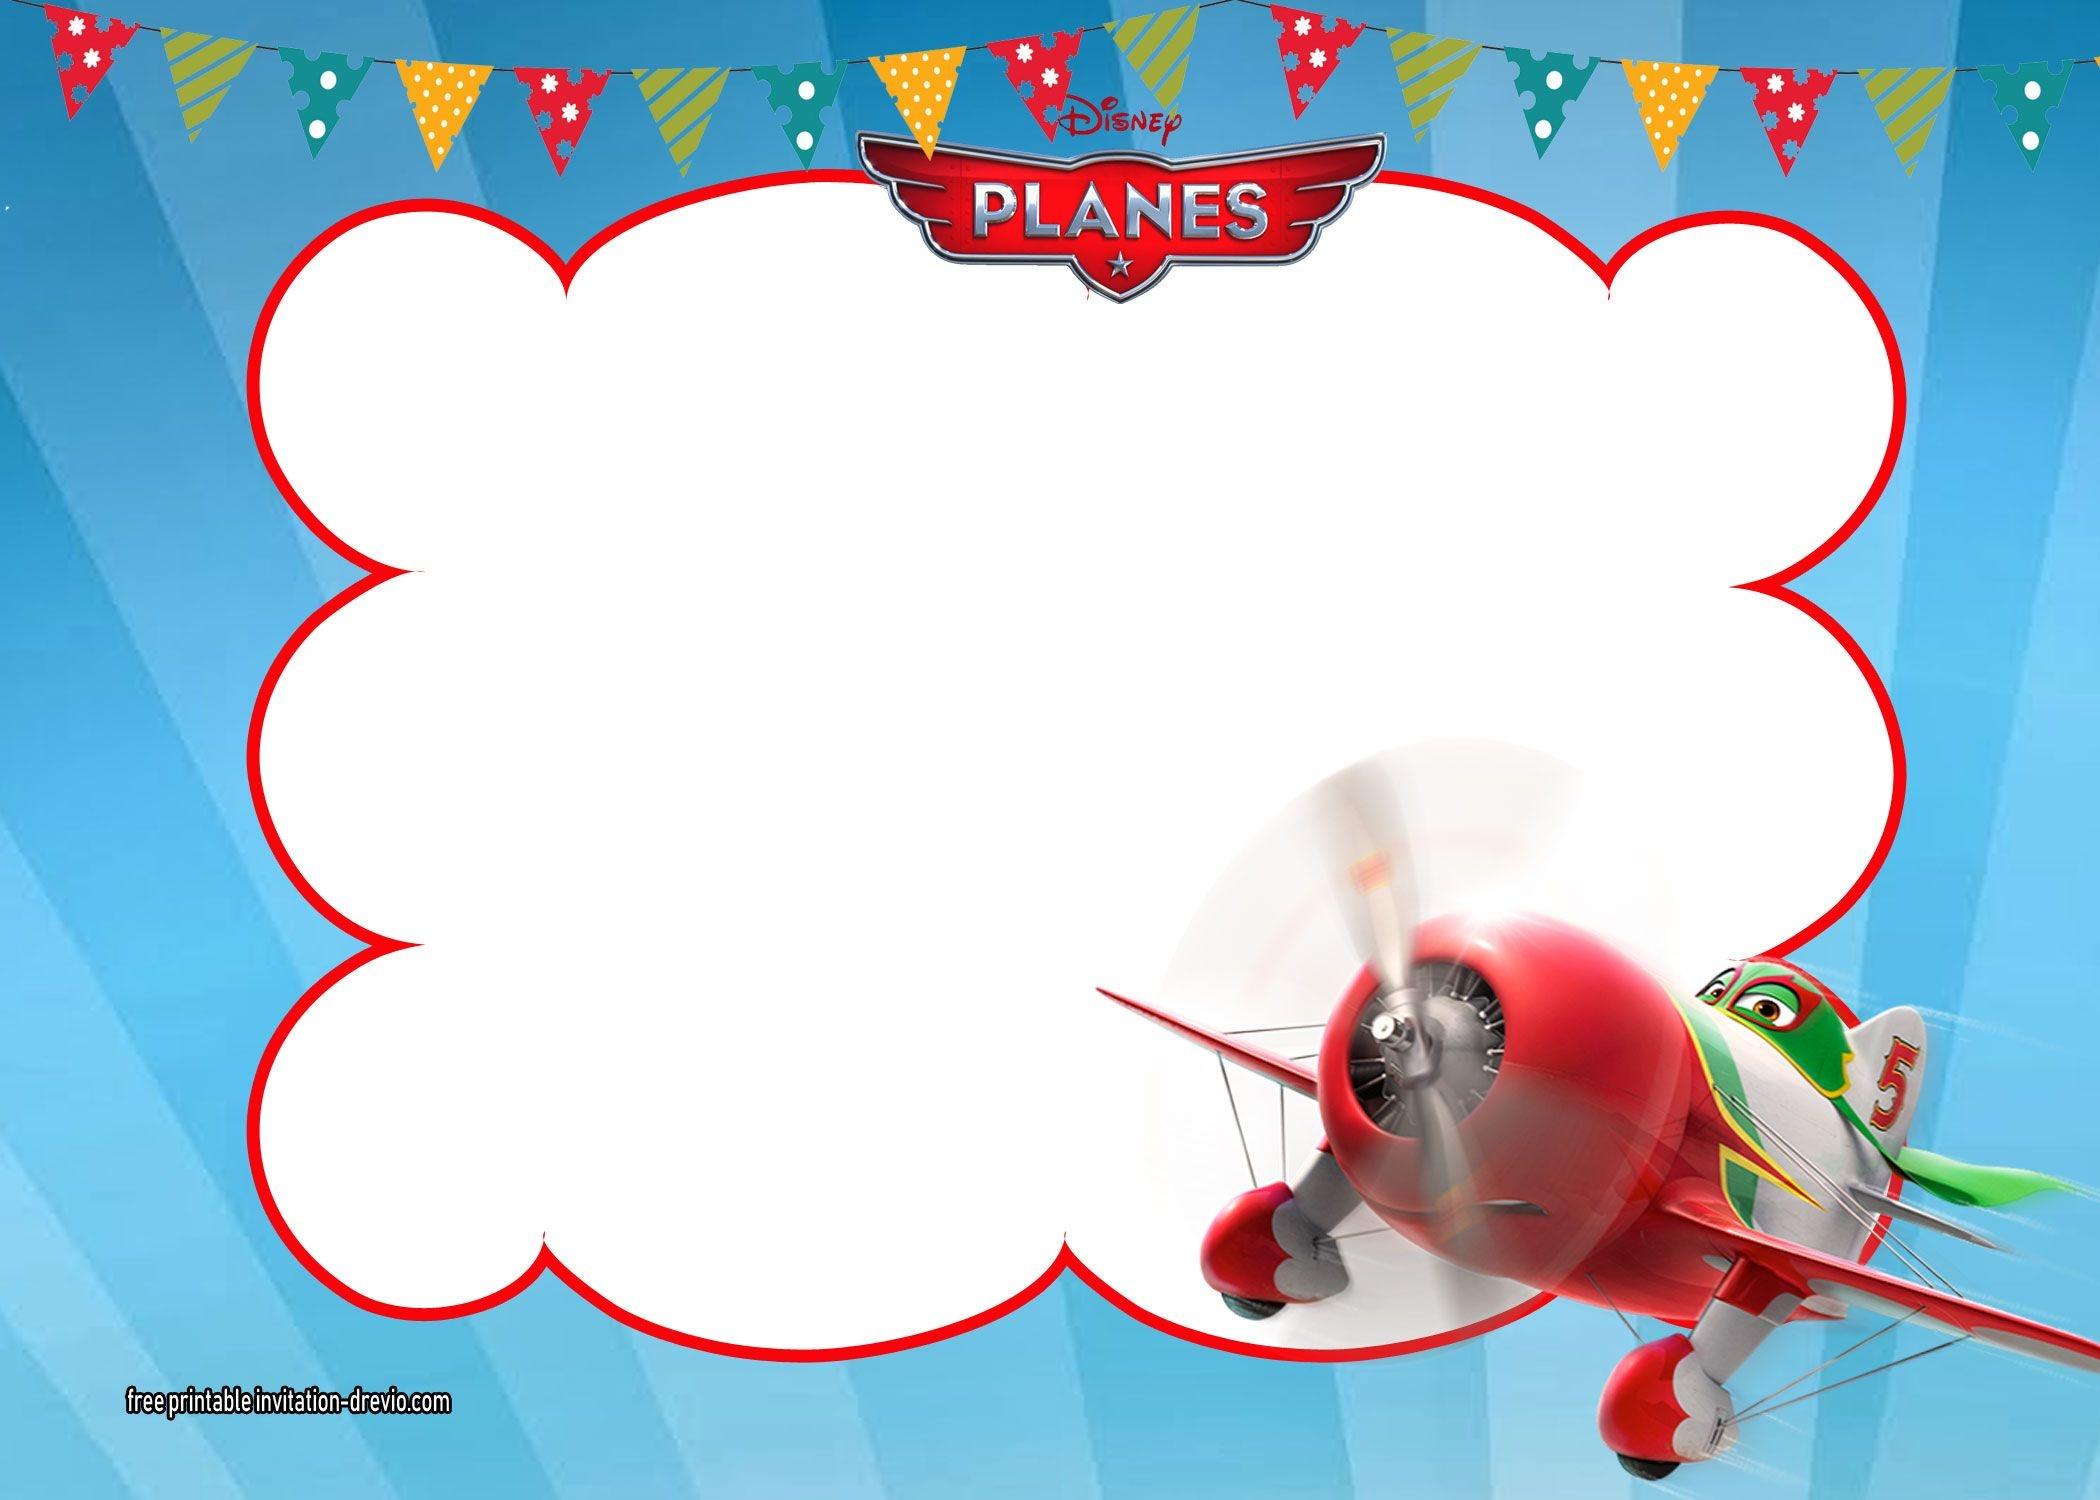 Disney Planes Invitations | Free Printable Birthday Invitation - Free Planes Printables